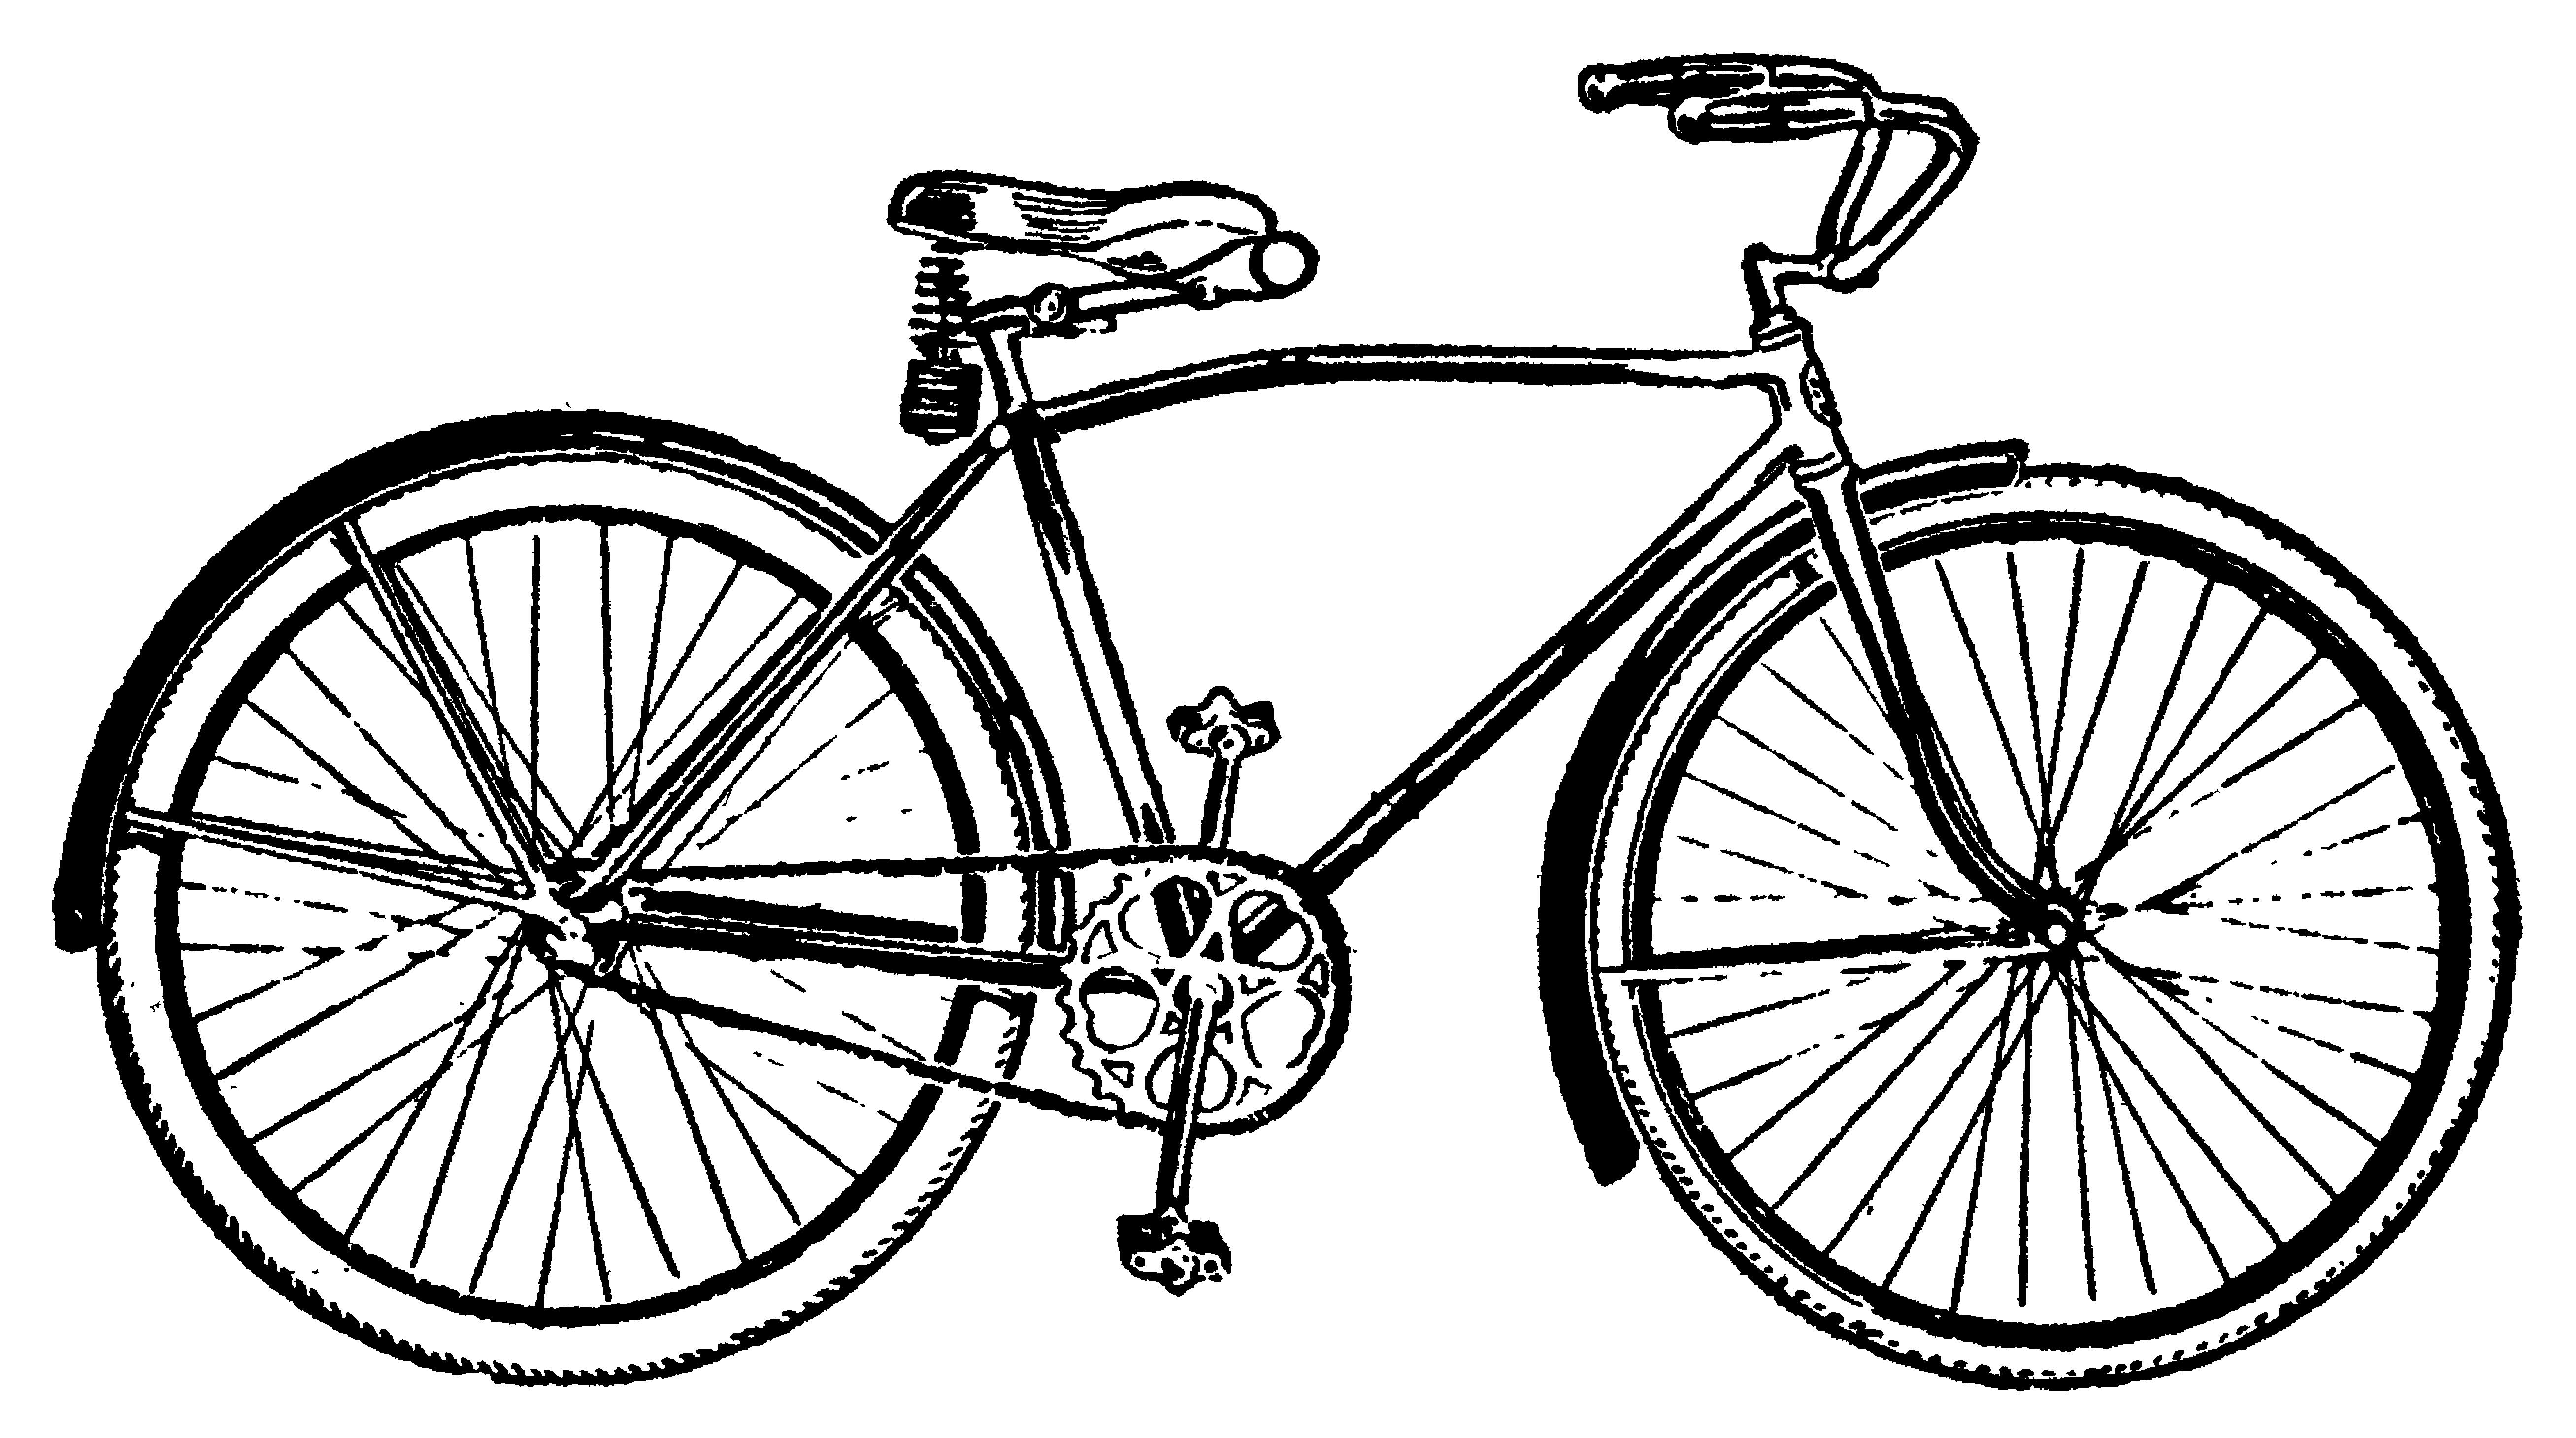 5230x2920 Vintage Bicycle Clip Art